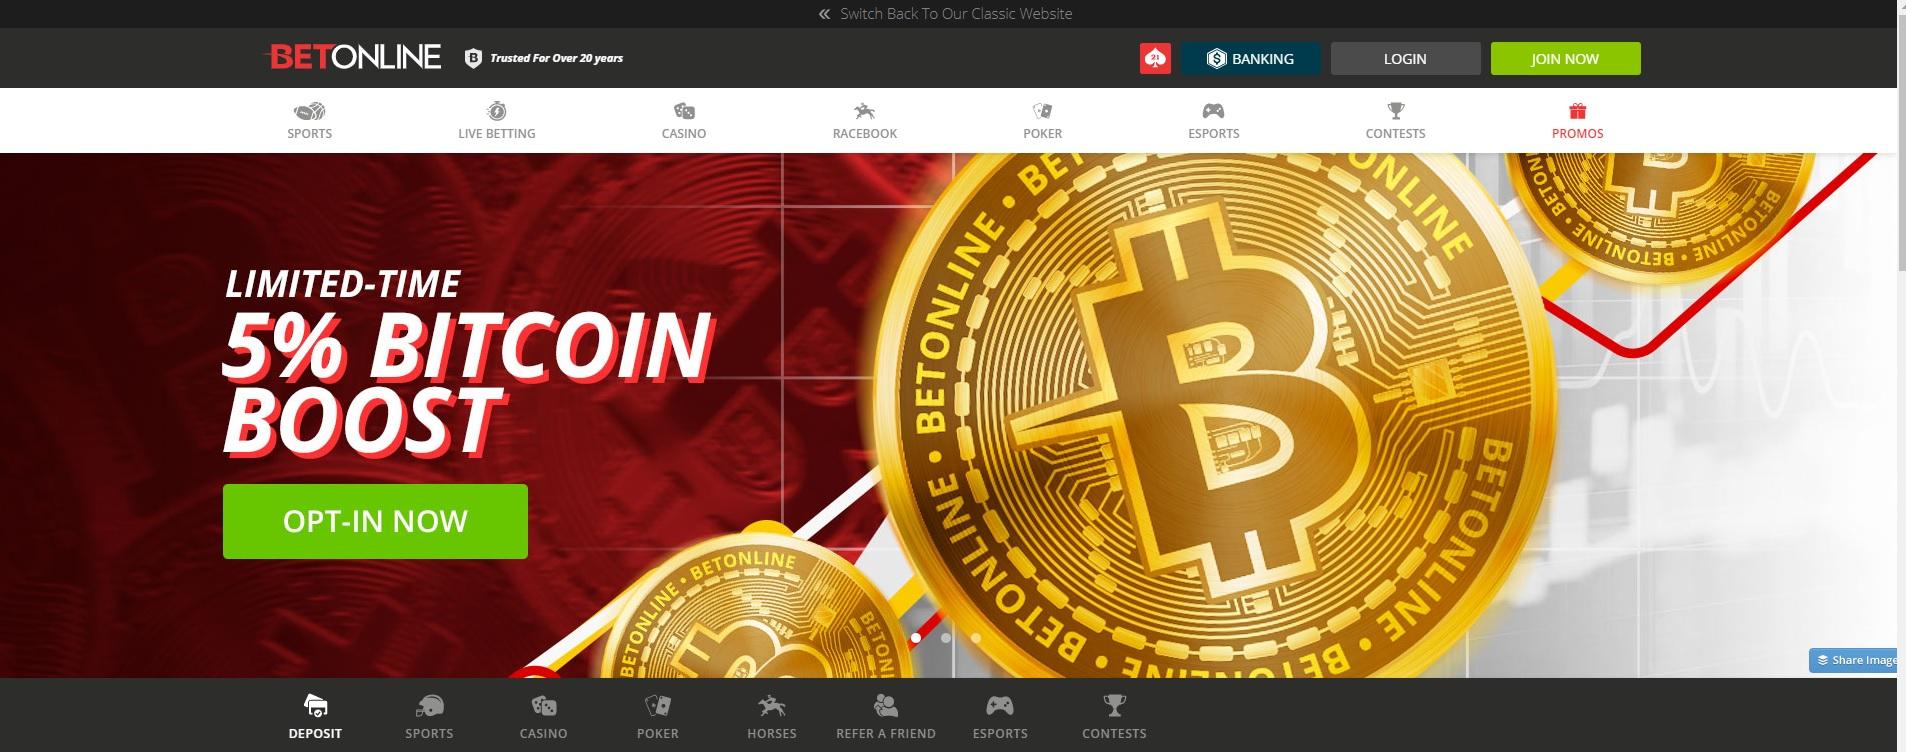 5% Bitcoin Deposit Boost Promotion